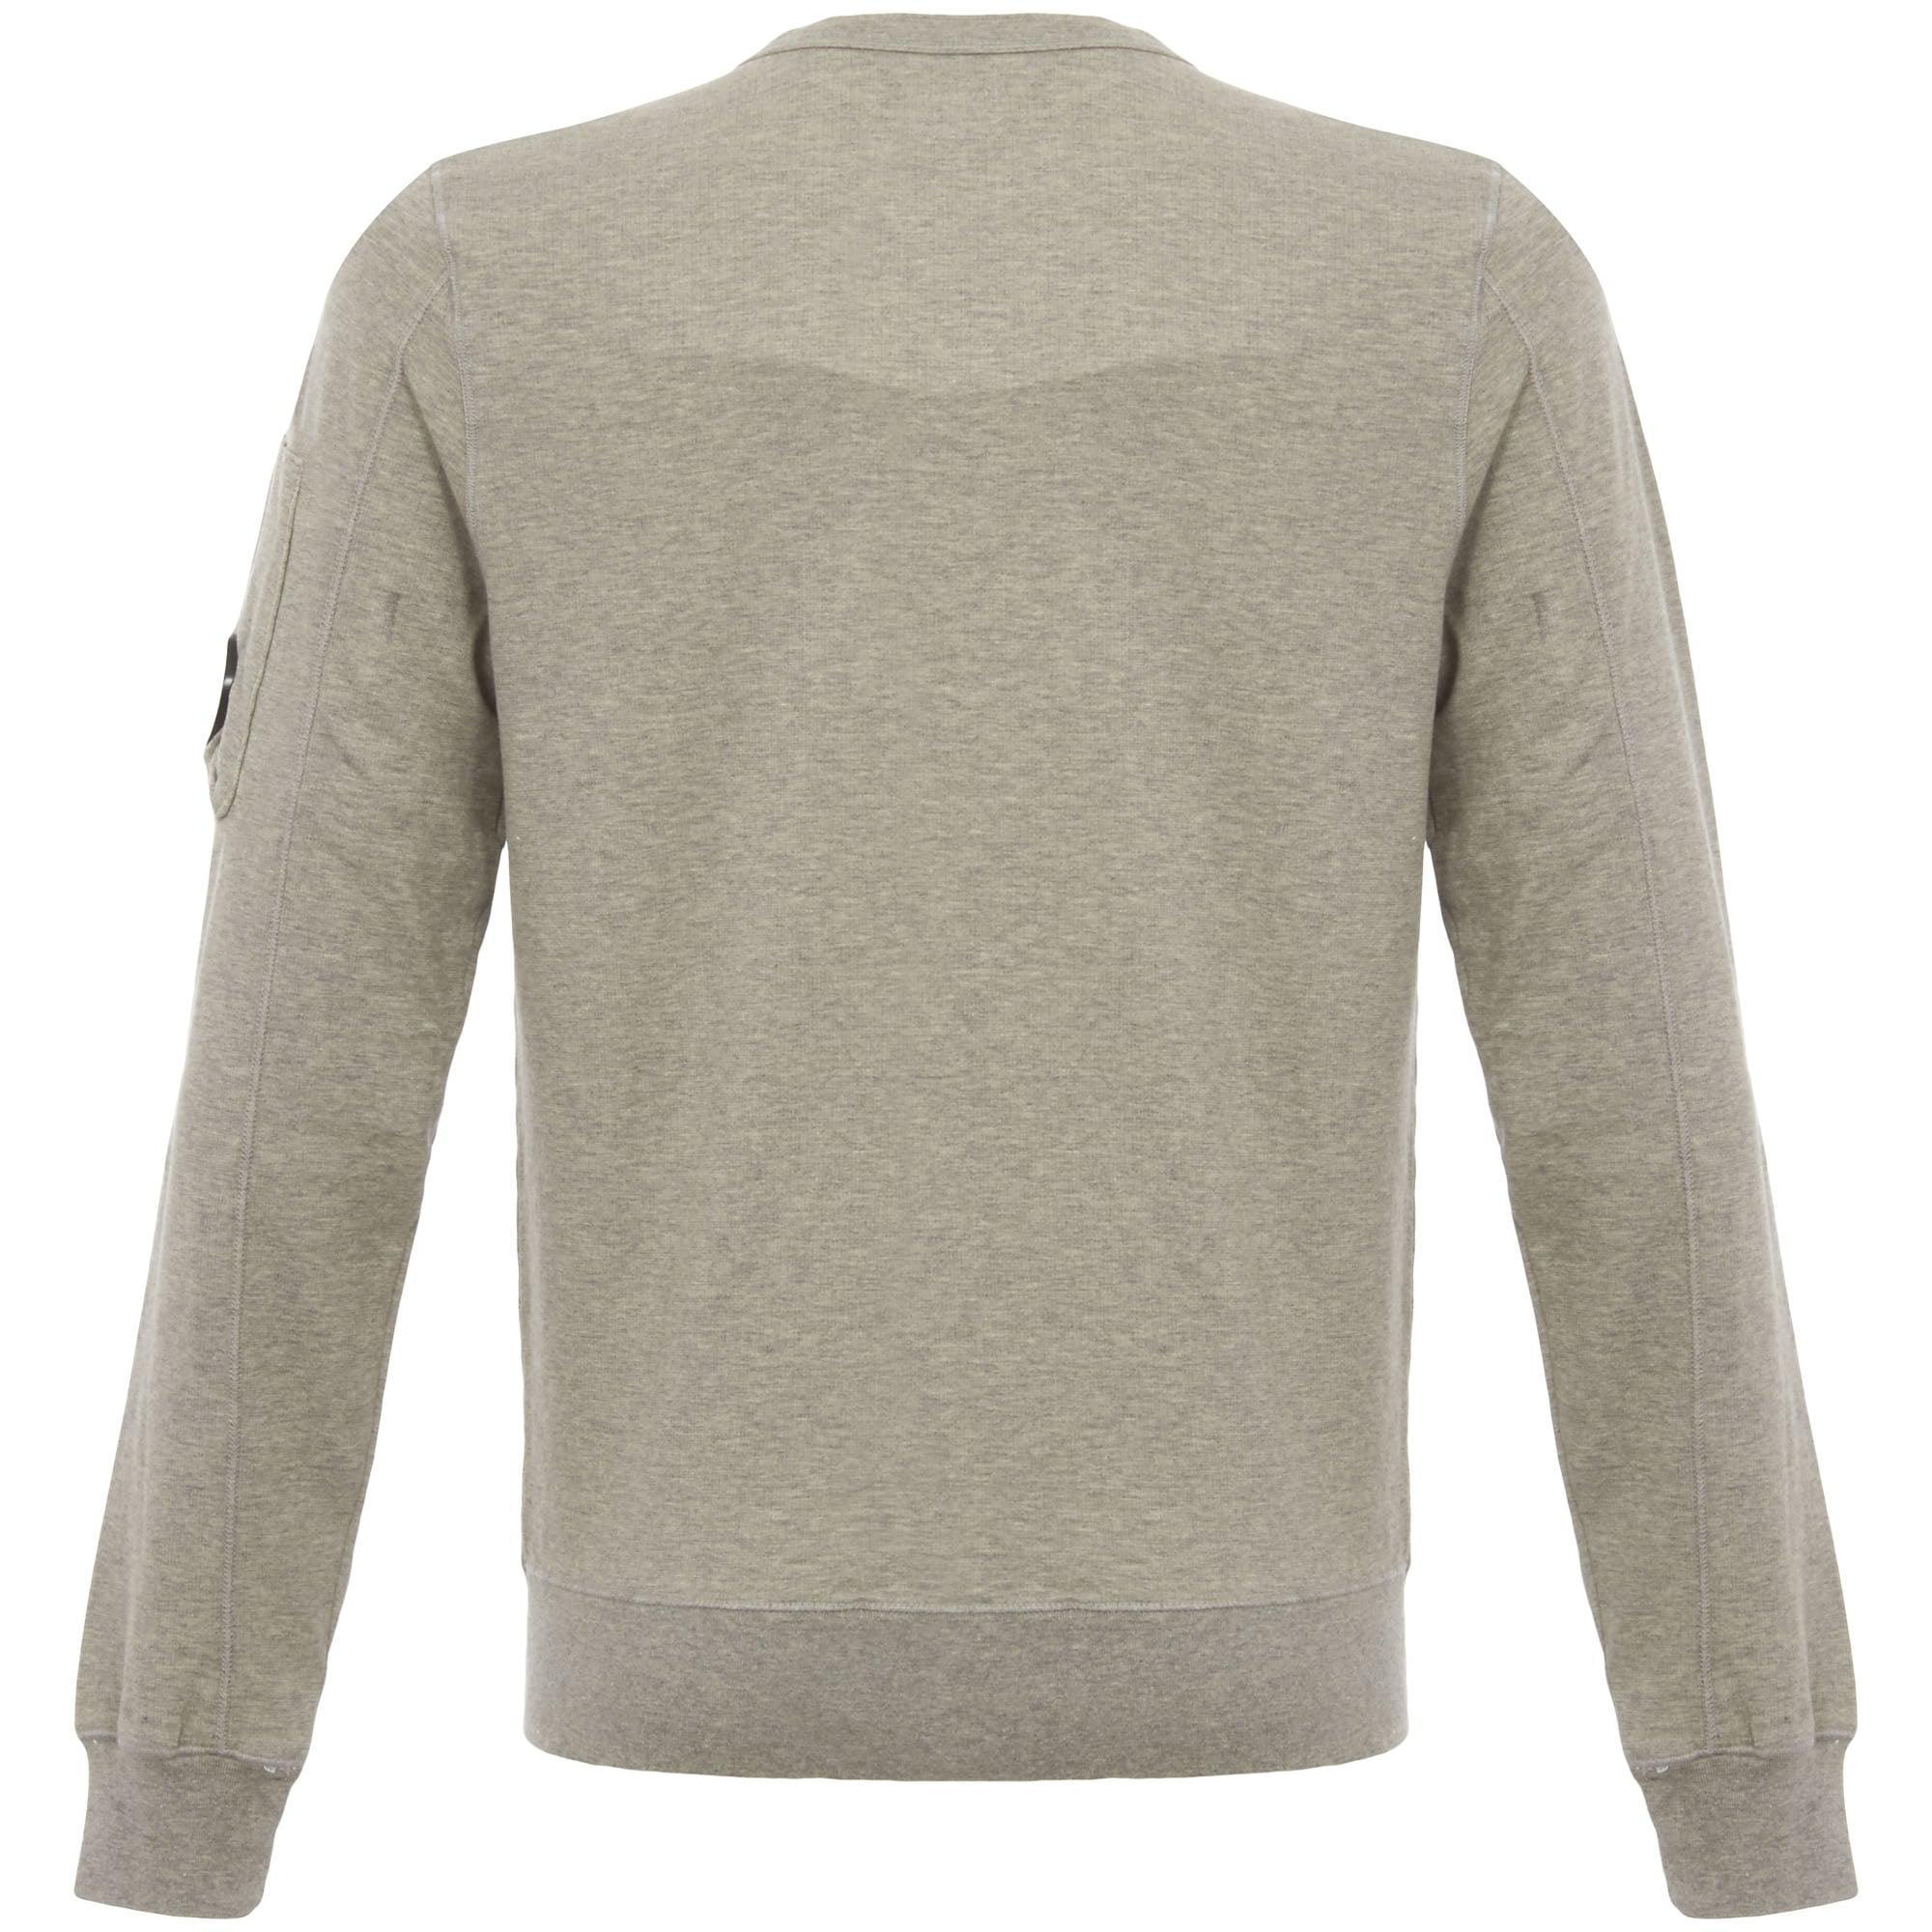 Lyst - C P Company Grey Melange Crew Neck Felpa Sweatshirt in Gray ... 2928d40cbdc